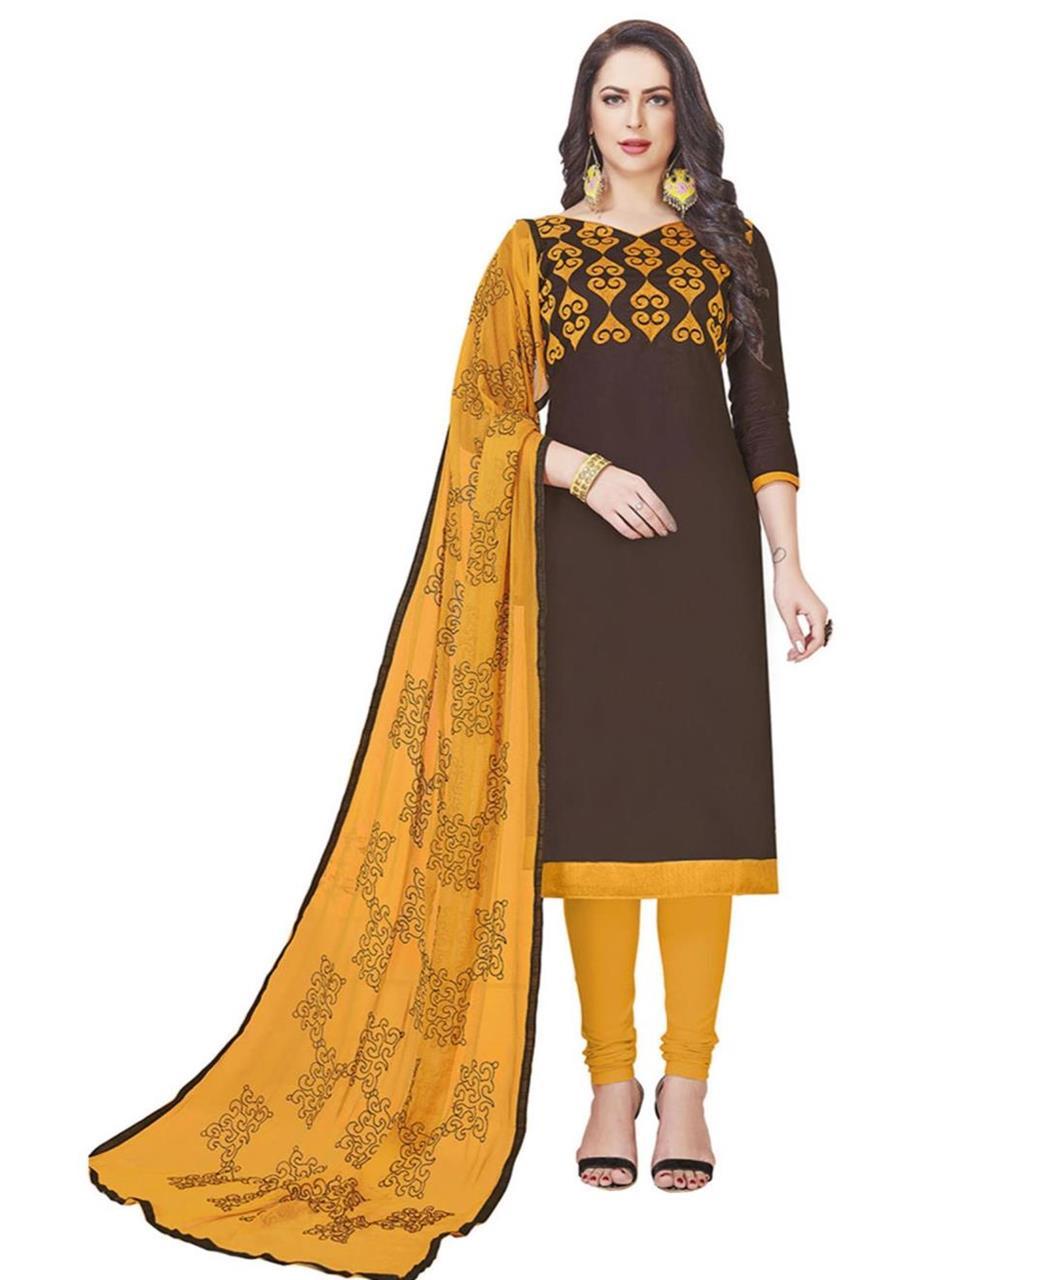 Embroidered Cotton Brown Straight Cut Salwar